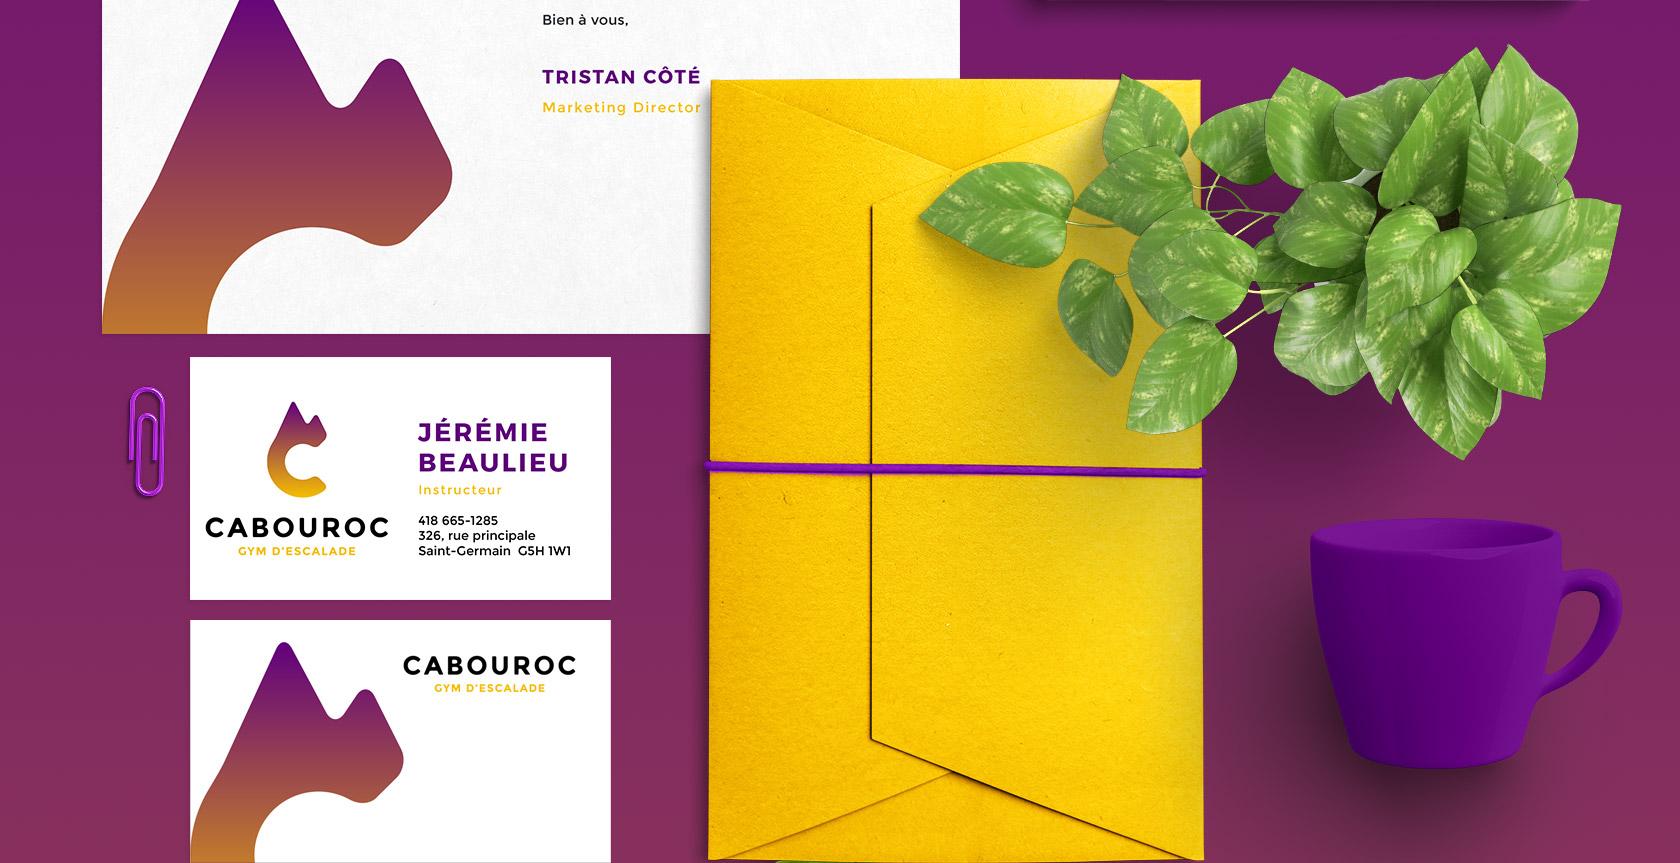 Agence-Phosphore-Portfolio-Branding-Cabouroc_05